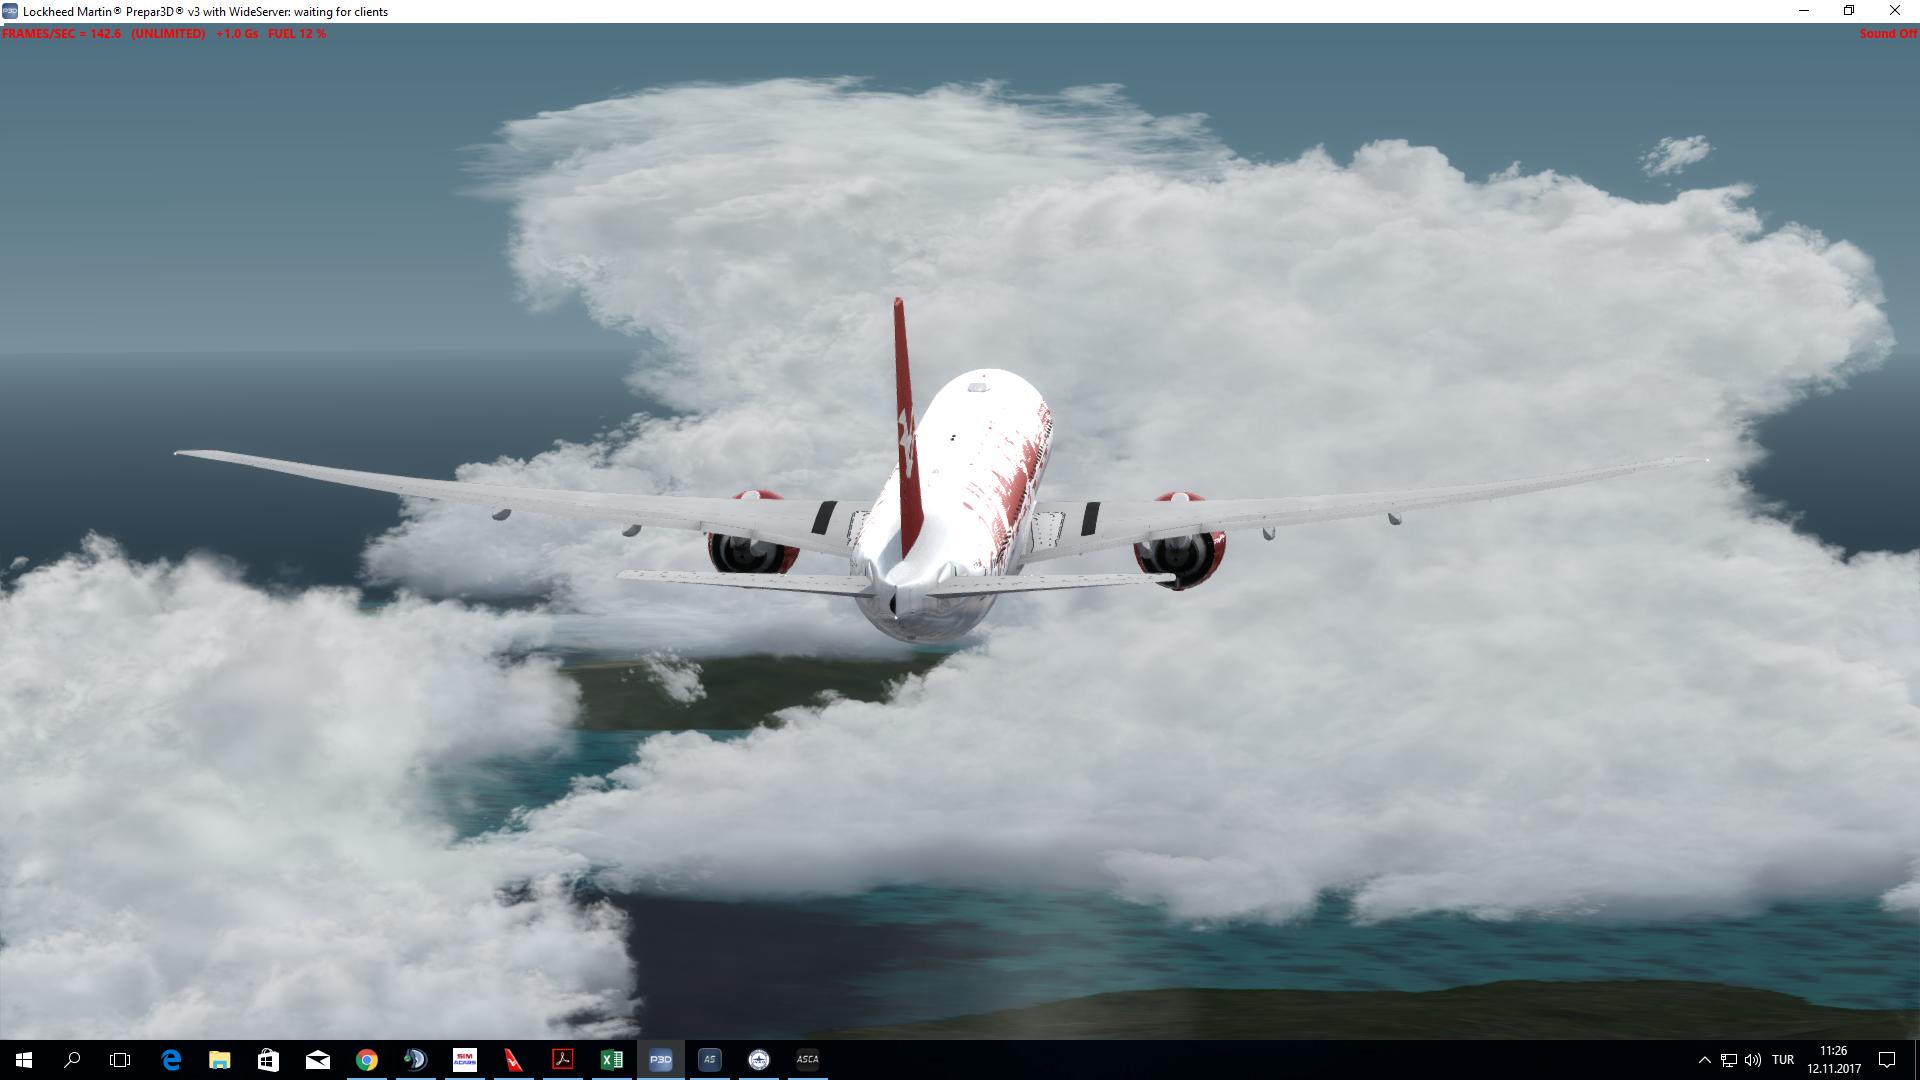 Desktop Screenshot 2017.11.12 - 11.26.08.47